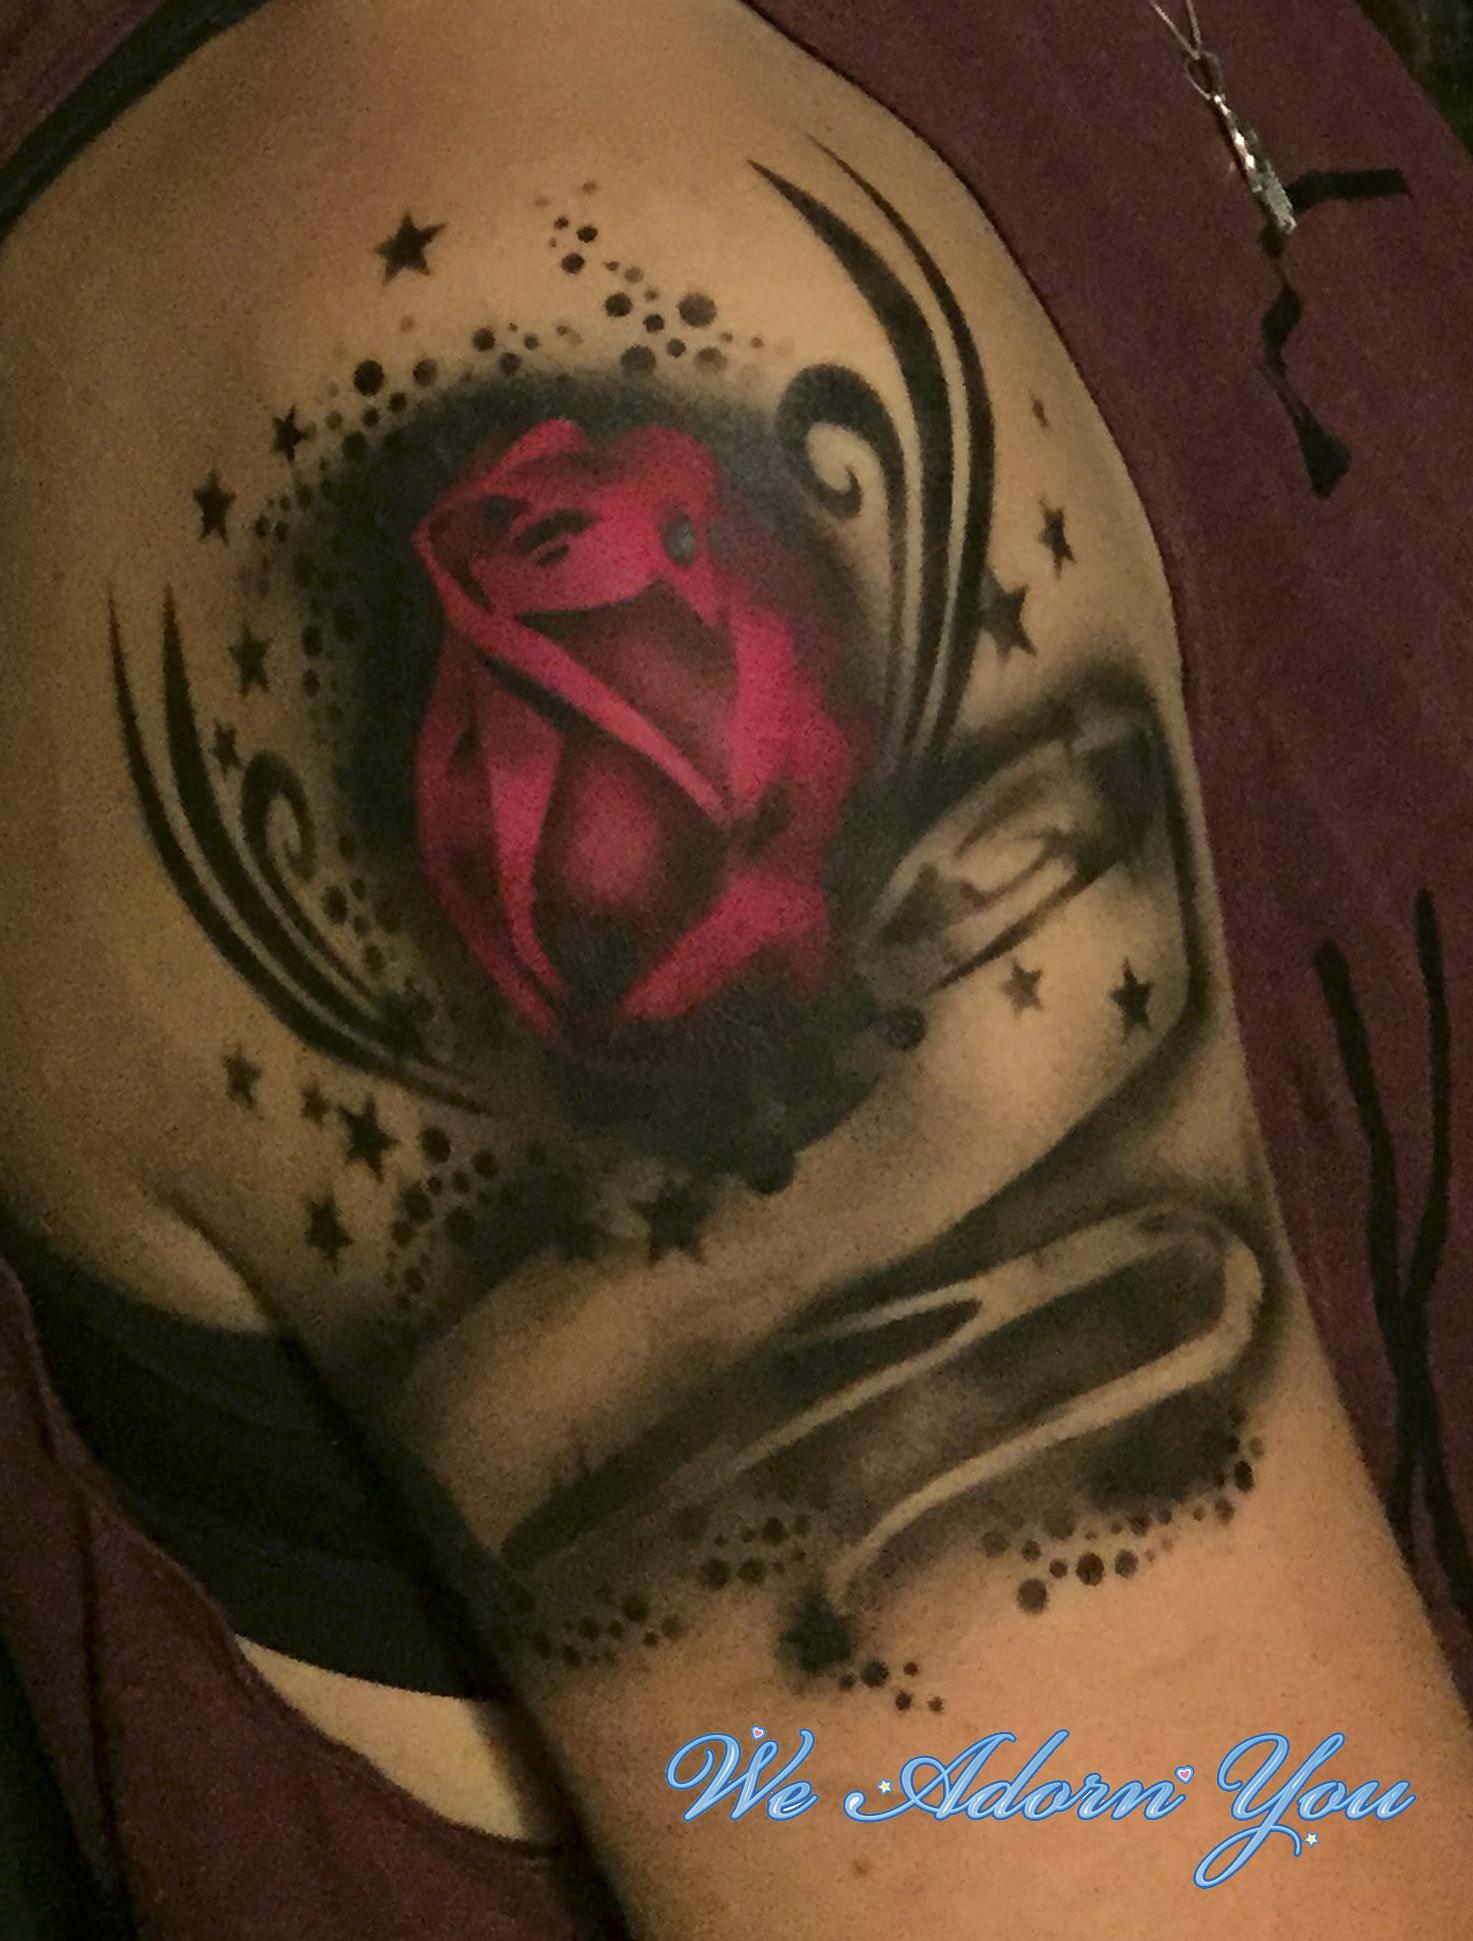 Premium Airbrush Tattoo Red Rose - We Adorn You.jpg